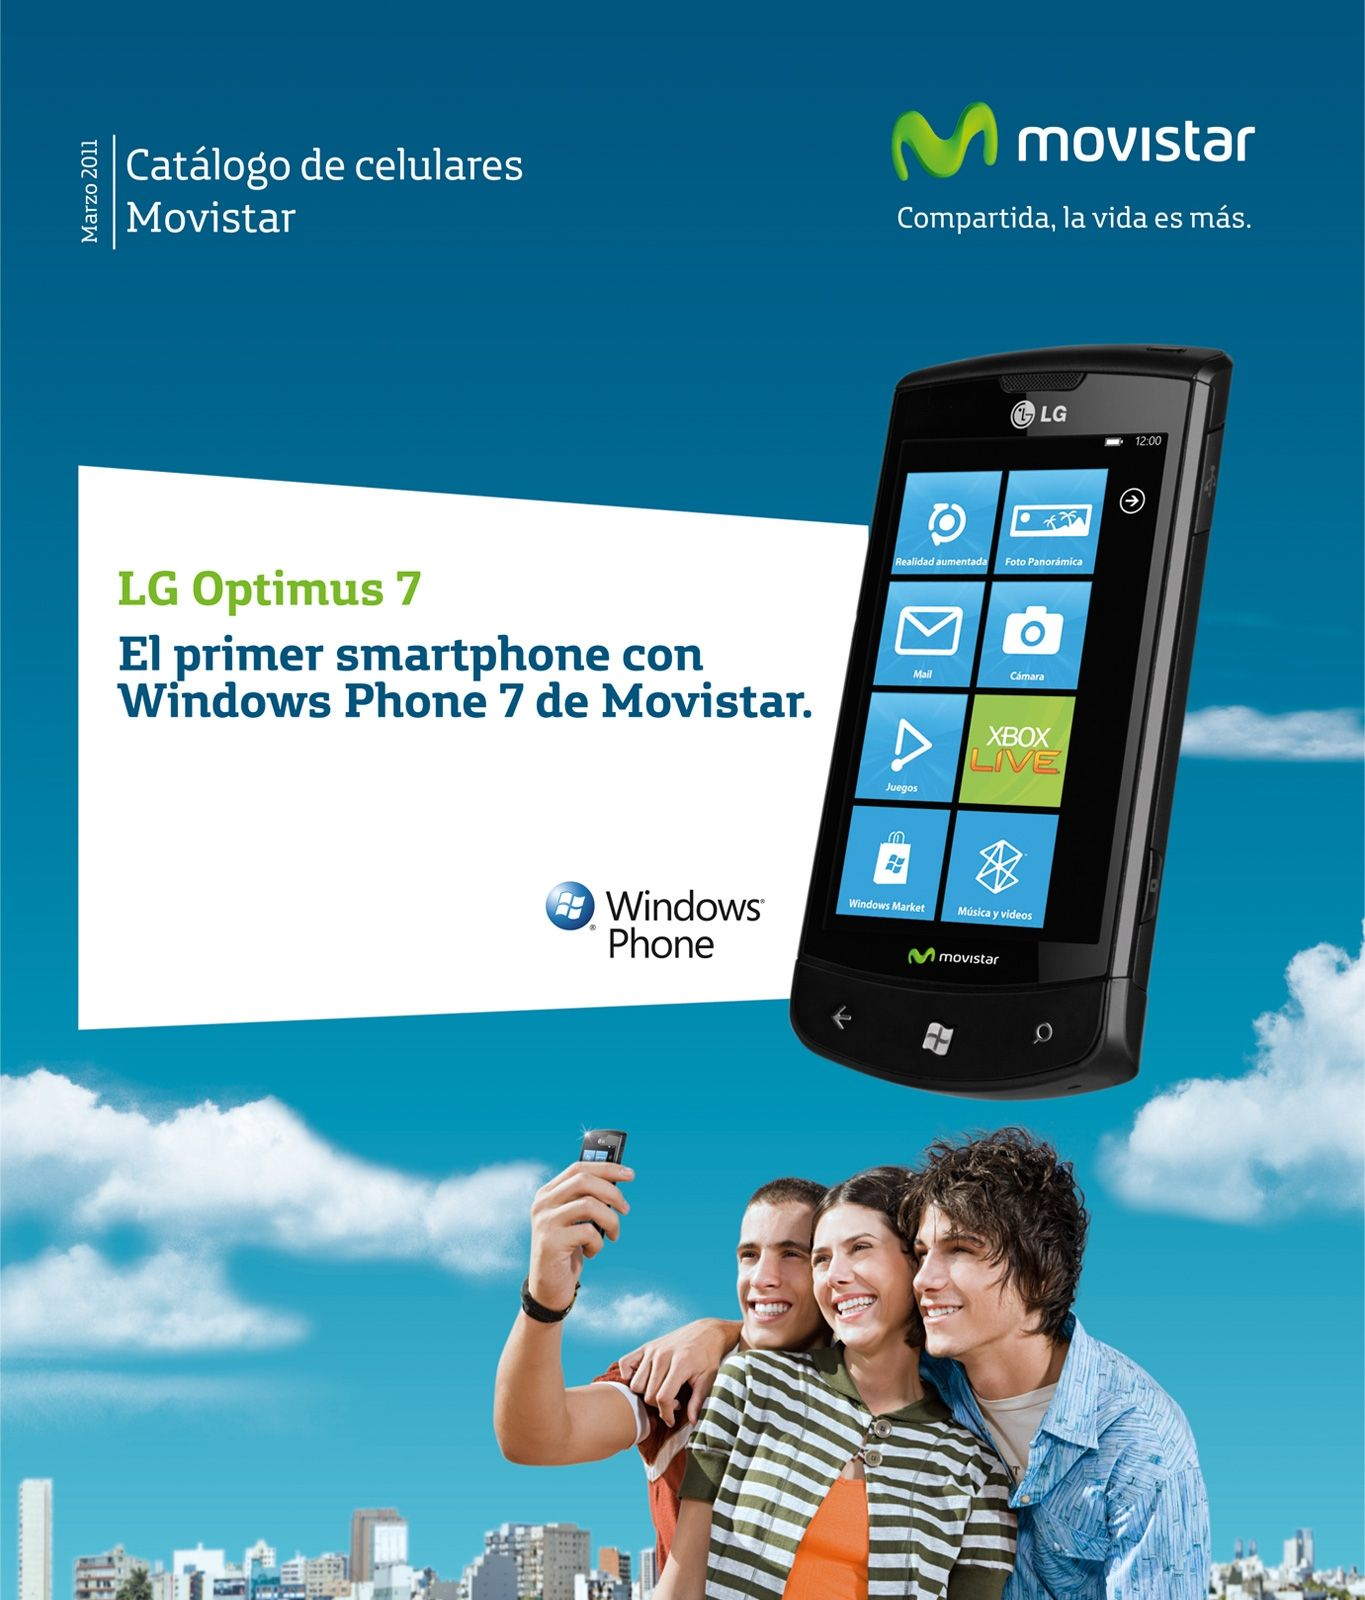 Movistar Perú: Catálogo Movistar Marzo 2011